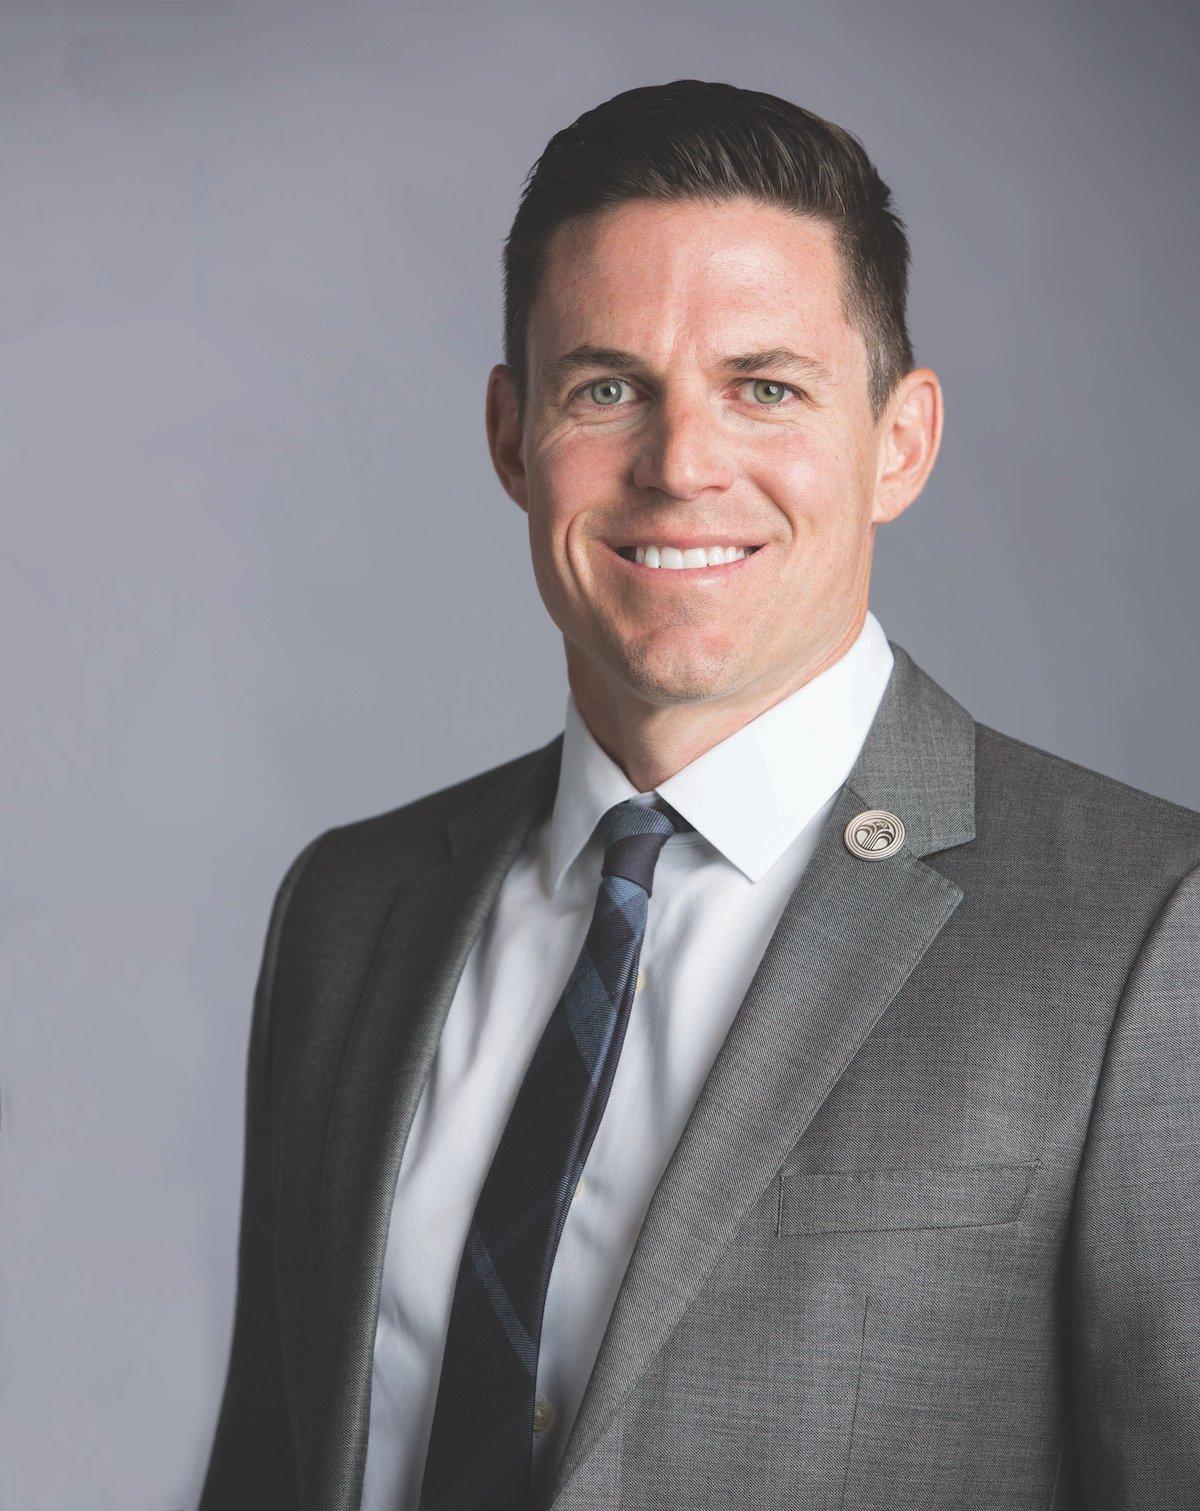 Ryan Napierski, President of Nu Skin